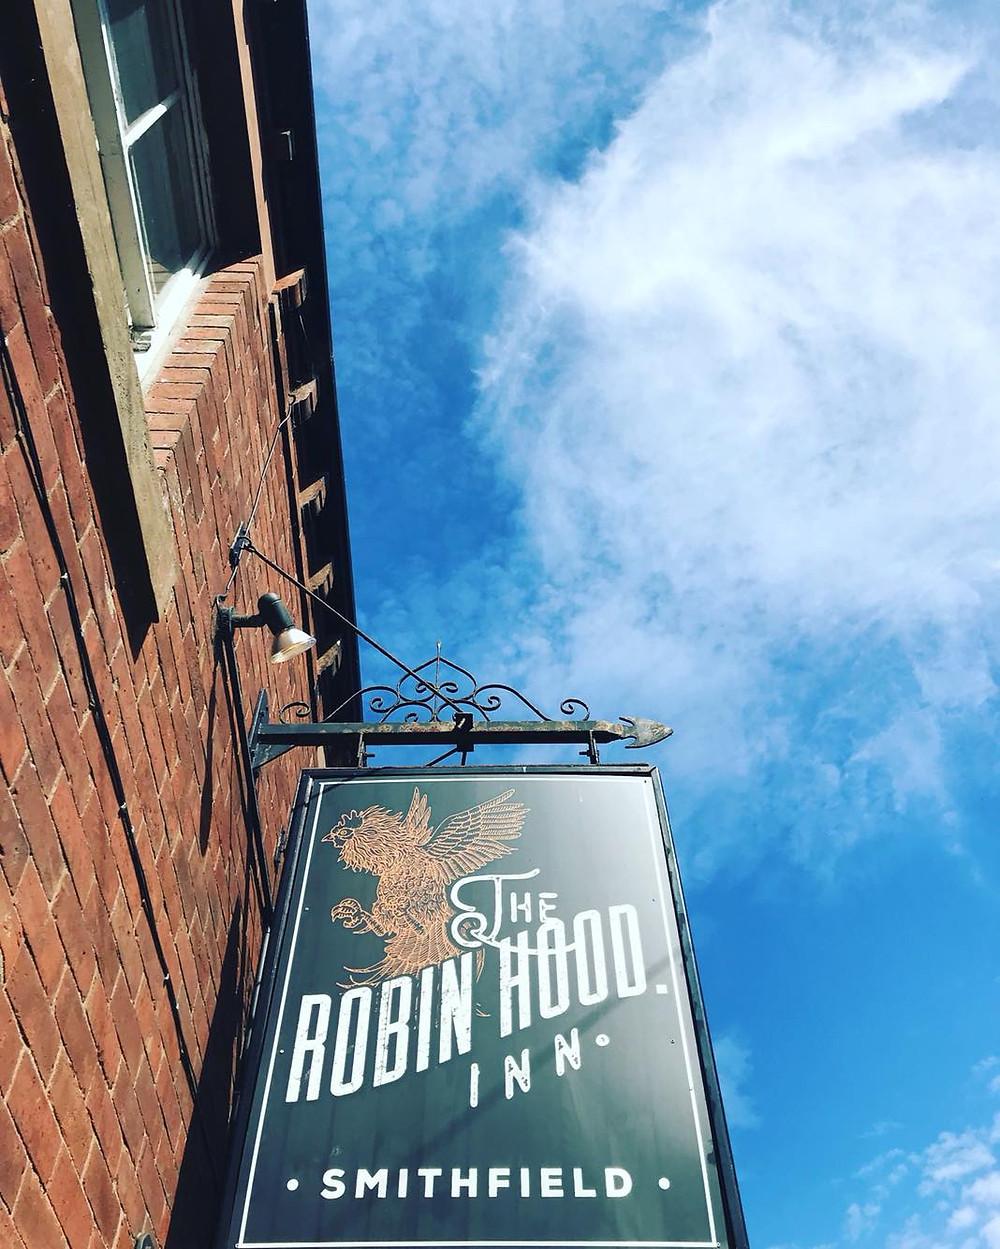 Online pub, wine cellar, community hub